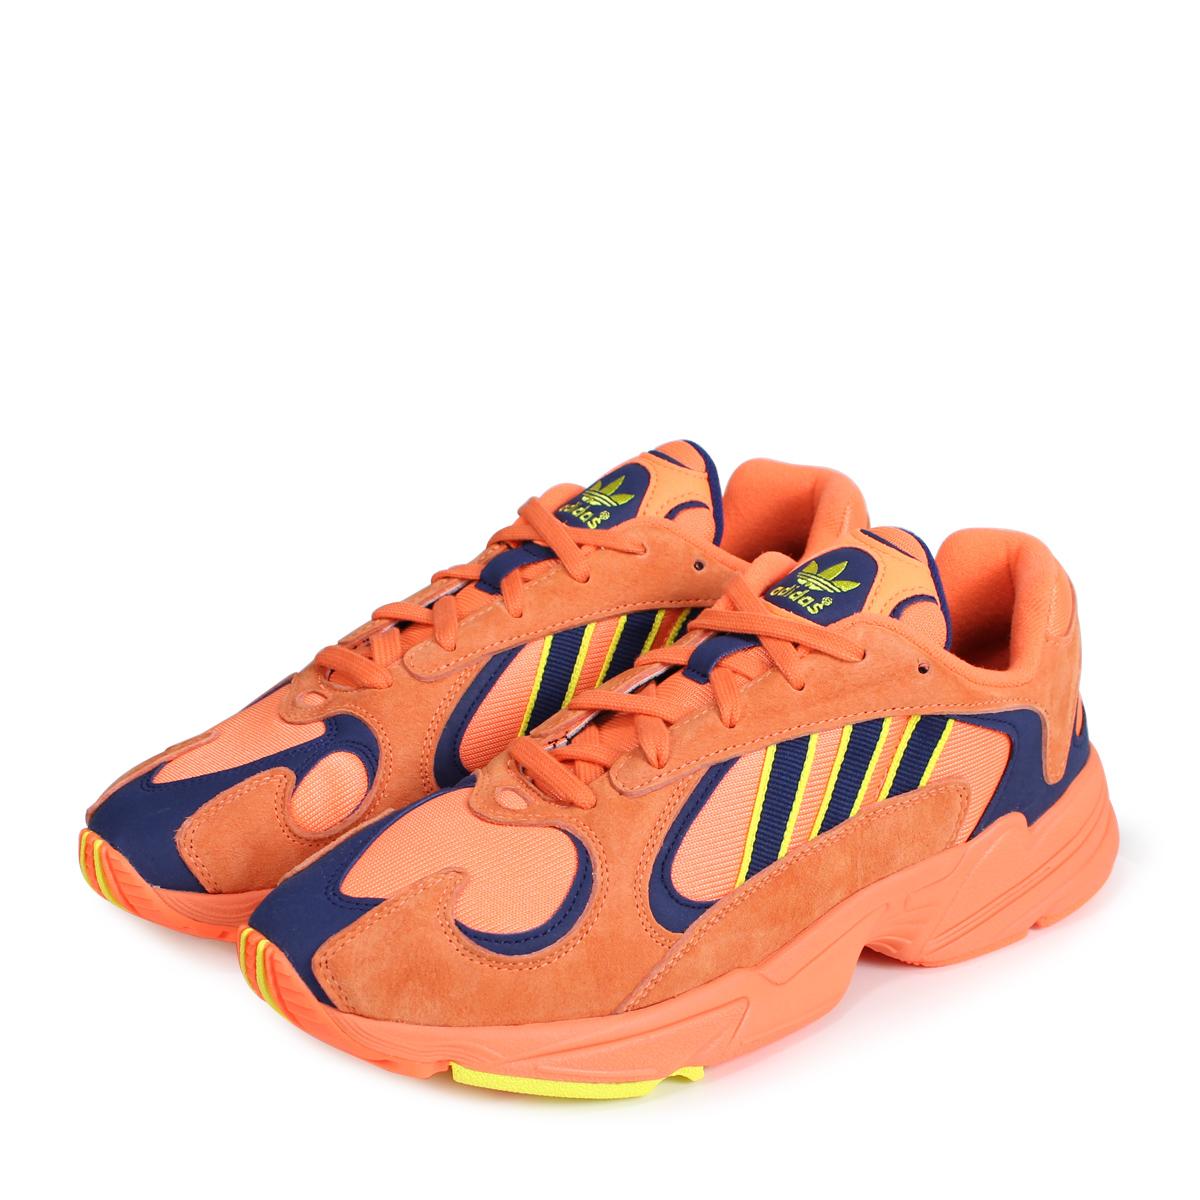 adidas Originals – Yung 1 – Sneaker in Orange, B37613